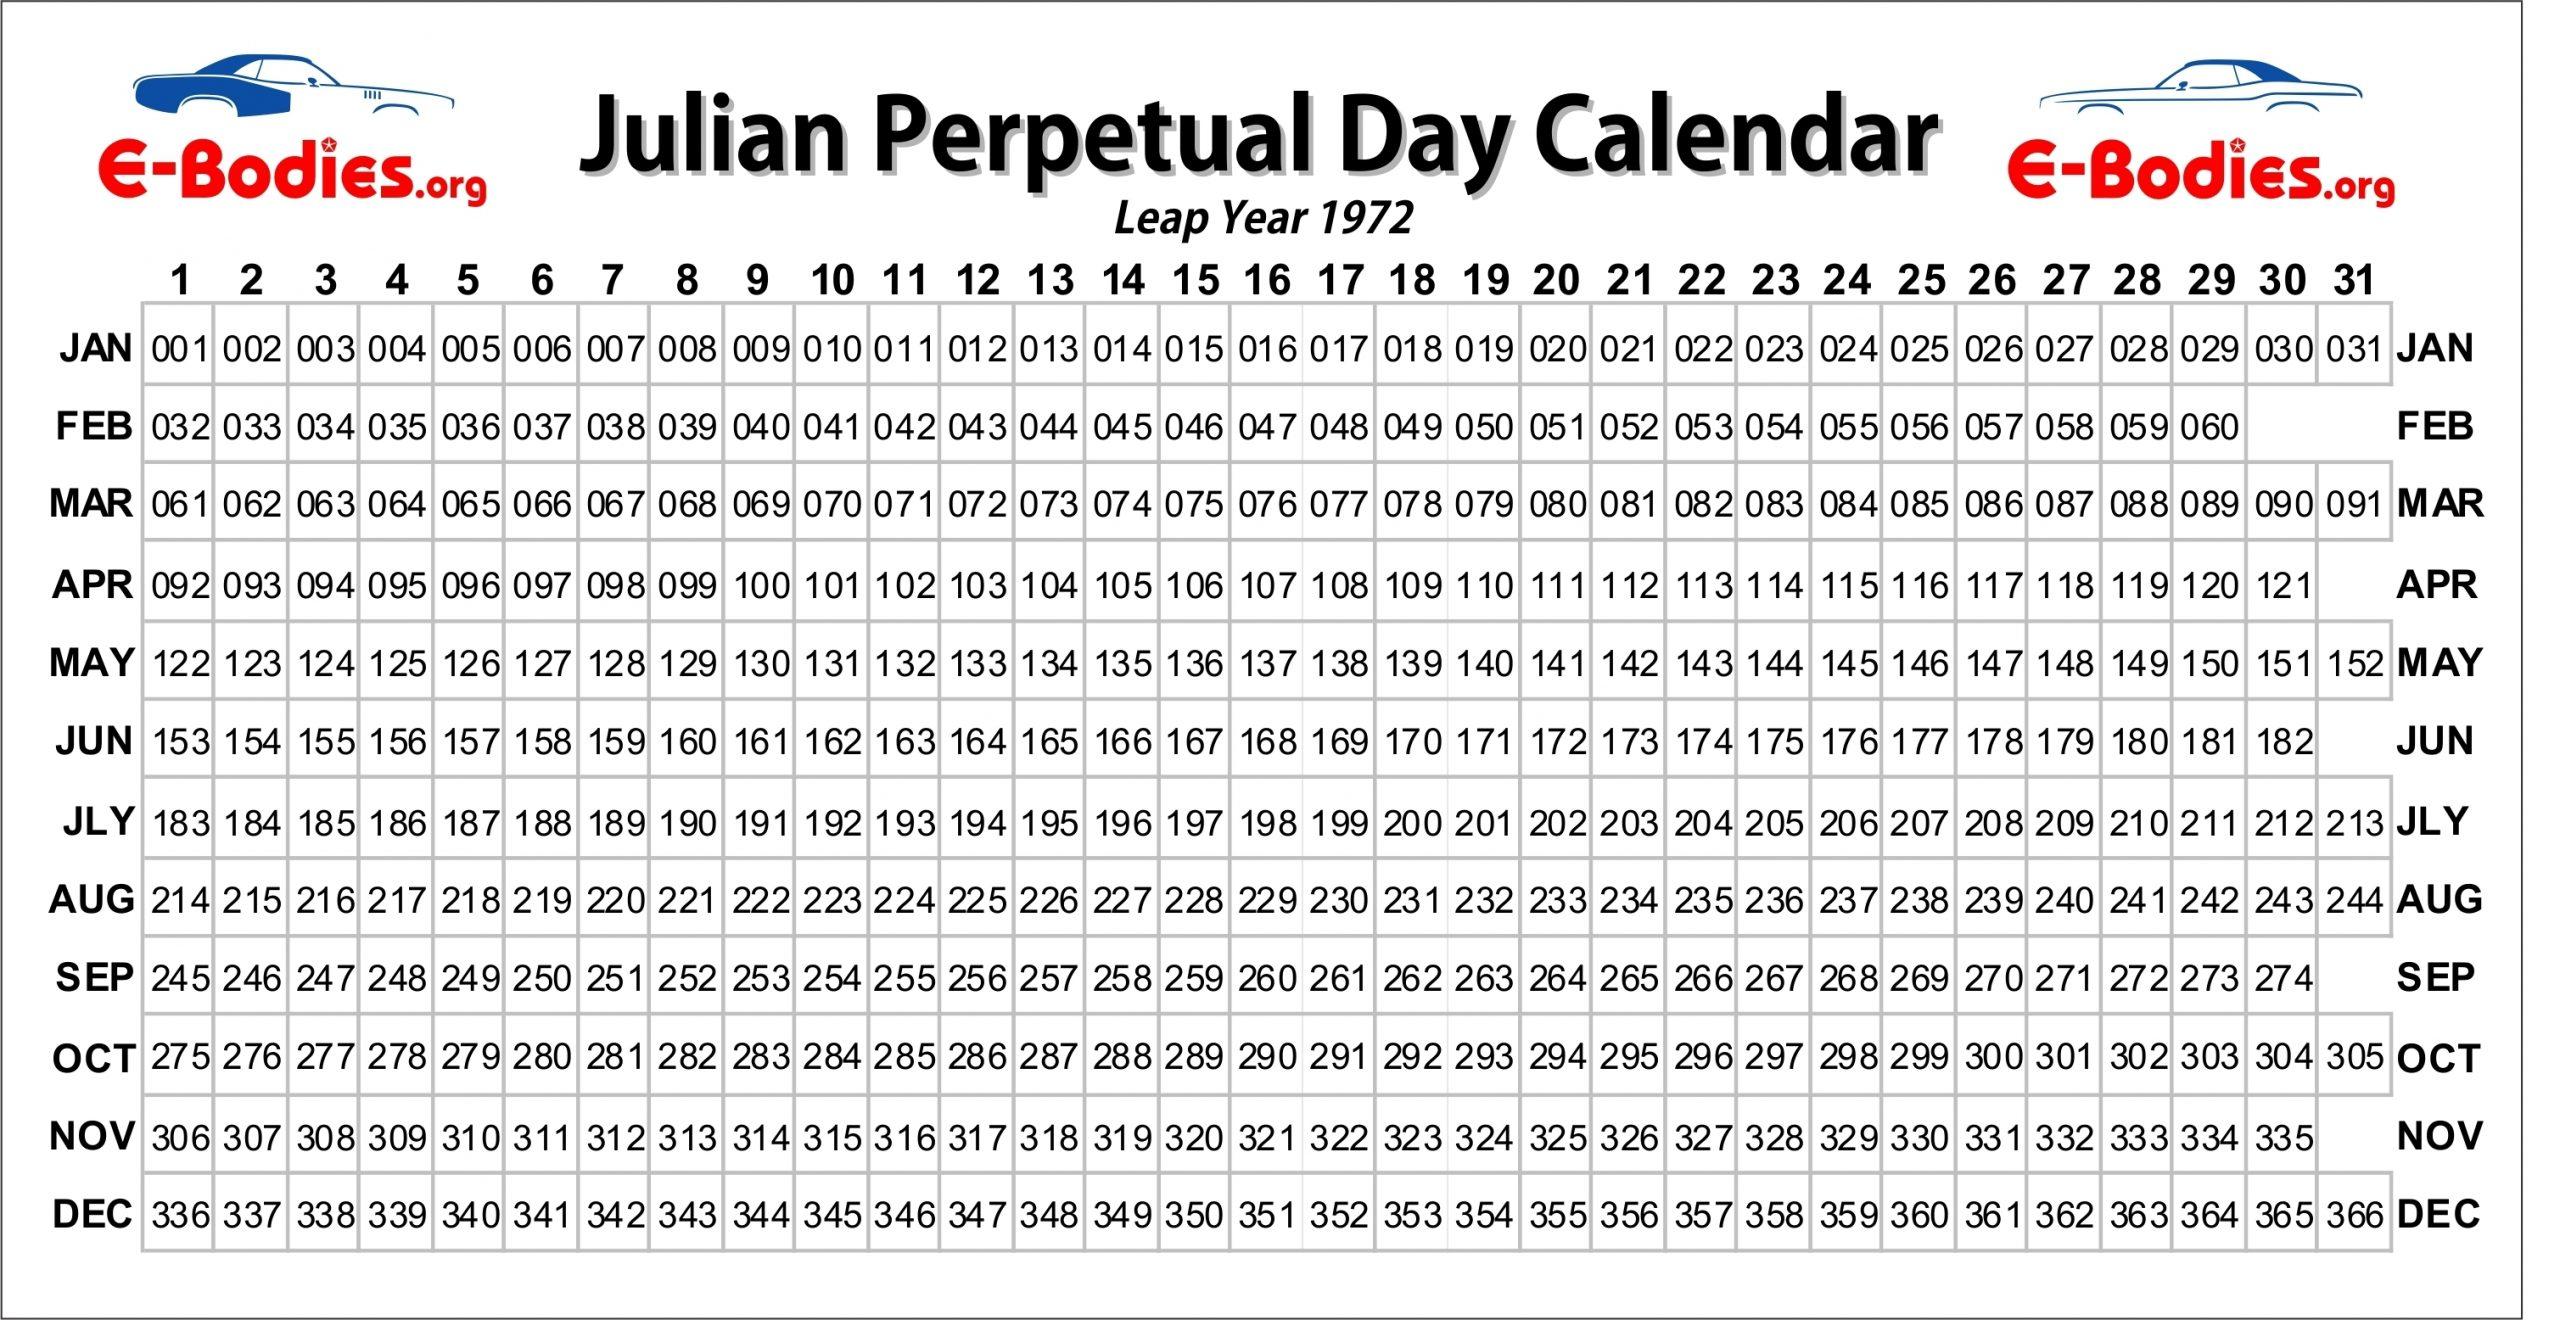 Pick Perpetual Vs Leap Year Julian Calender